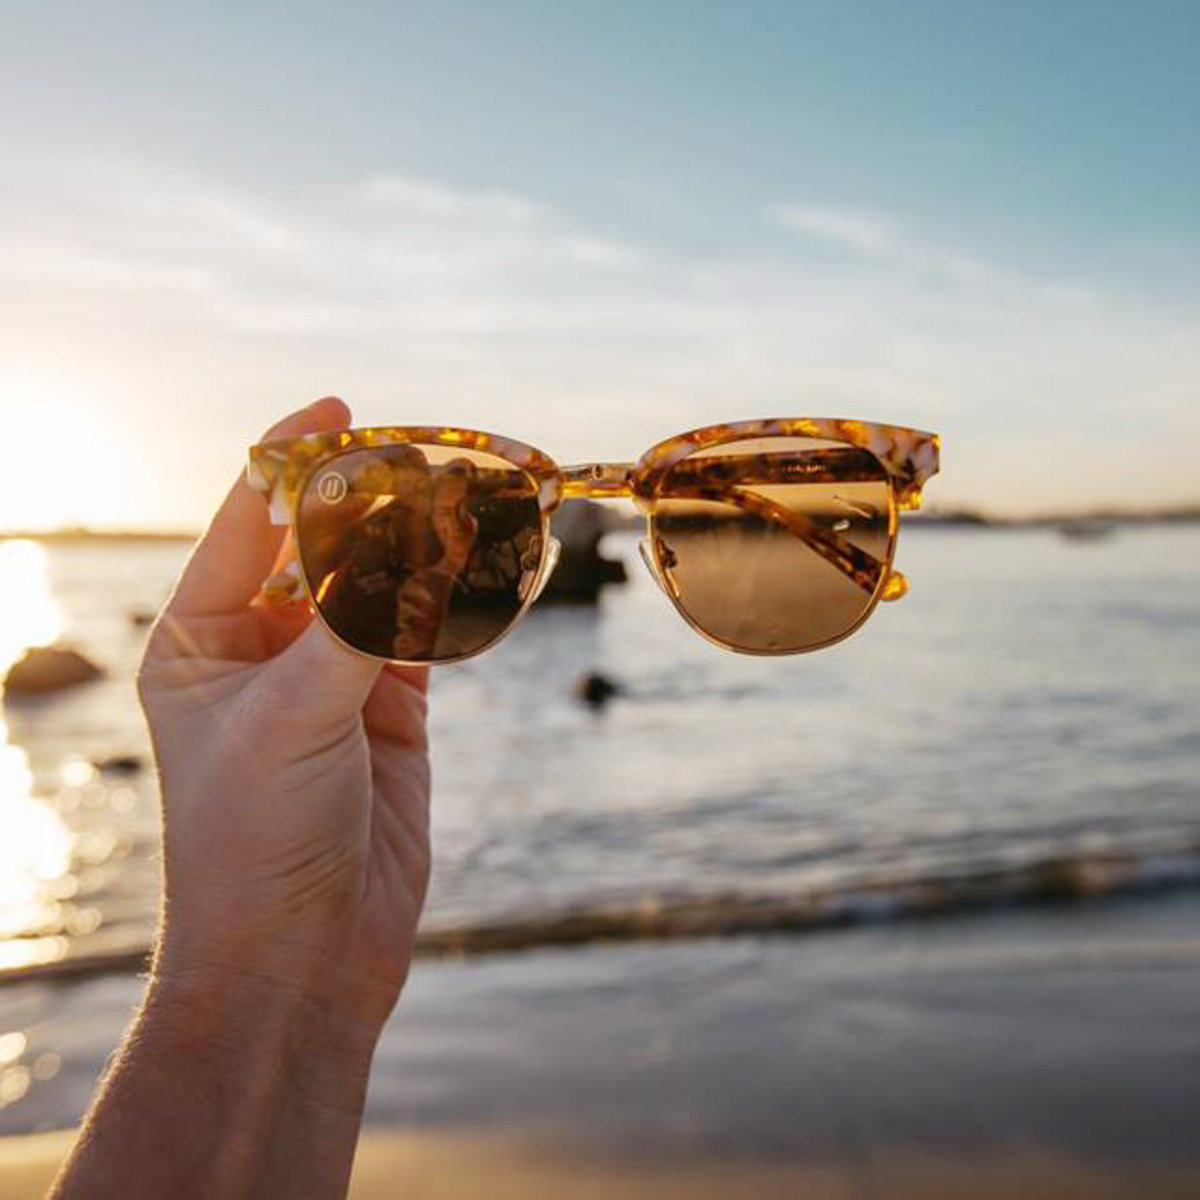 Cardiff // Gold Mamba Polarized Sunglasses